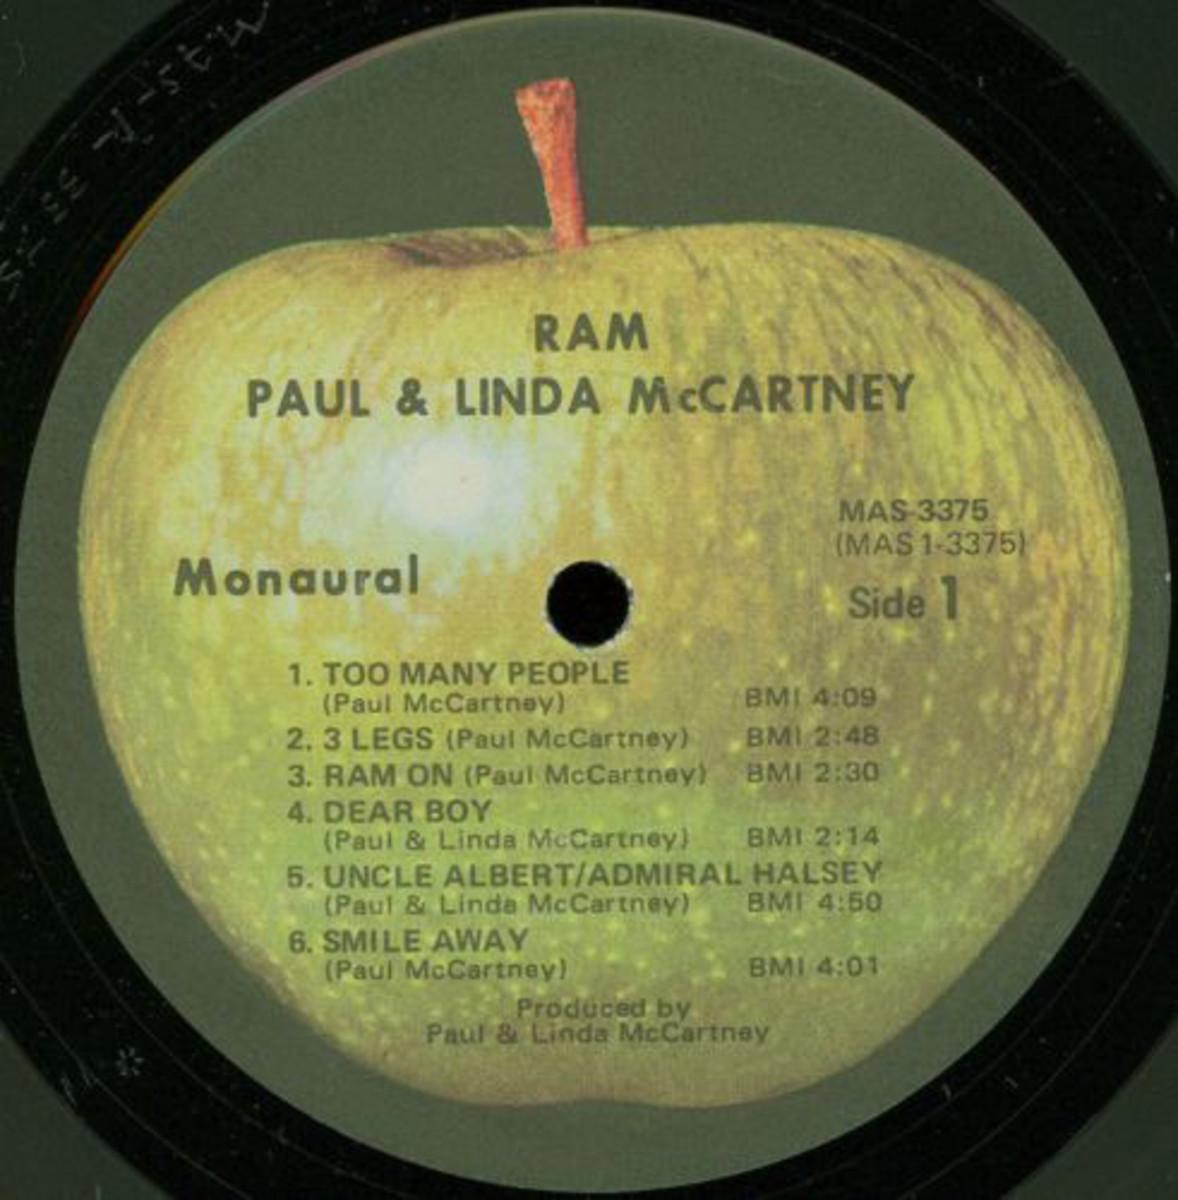 Ram-Mccartney-mono